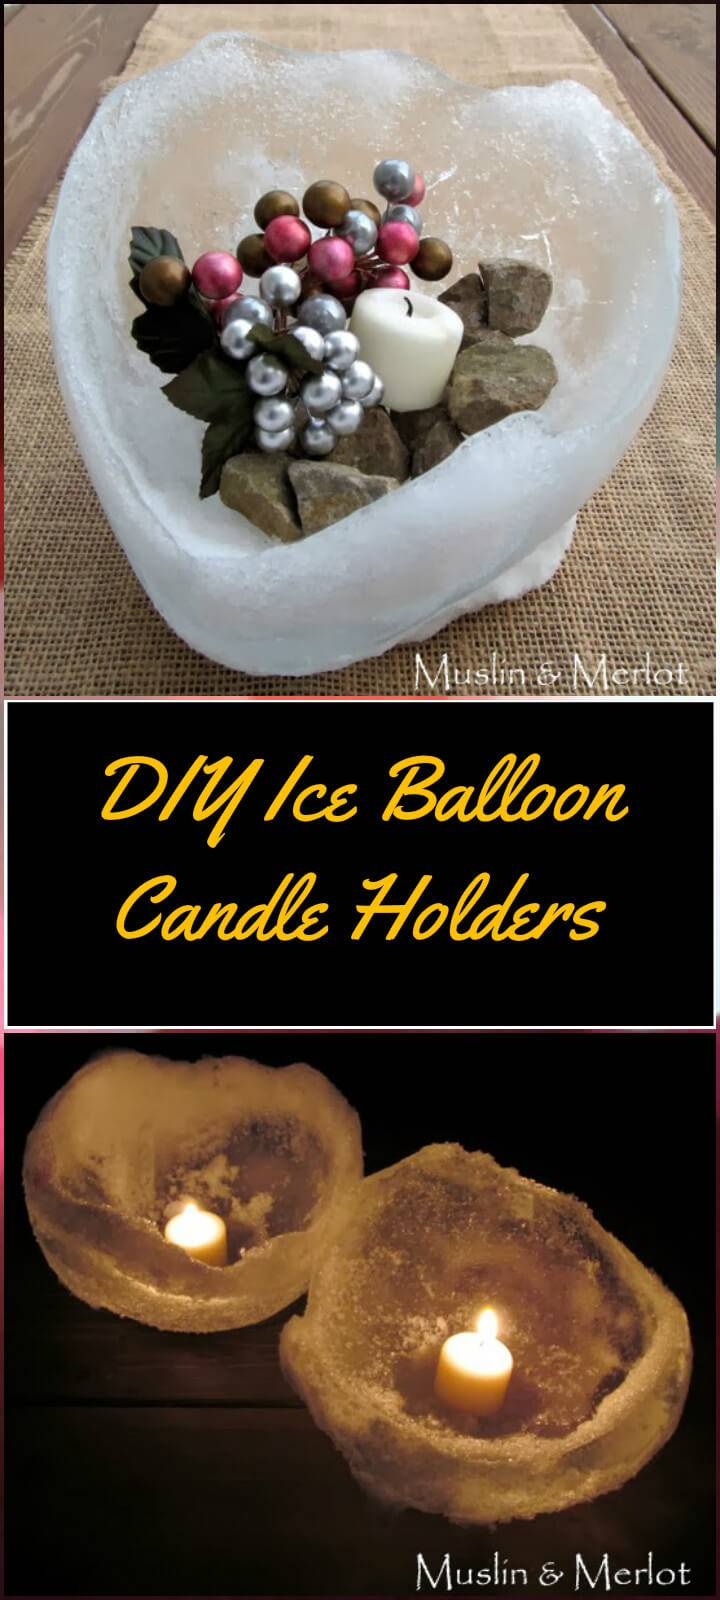 easy ice balloon candle hiolders